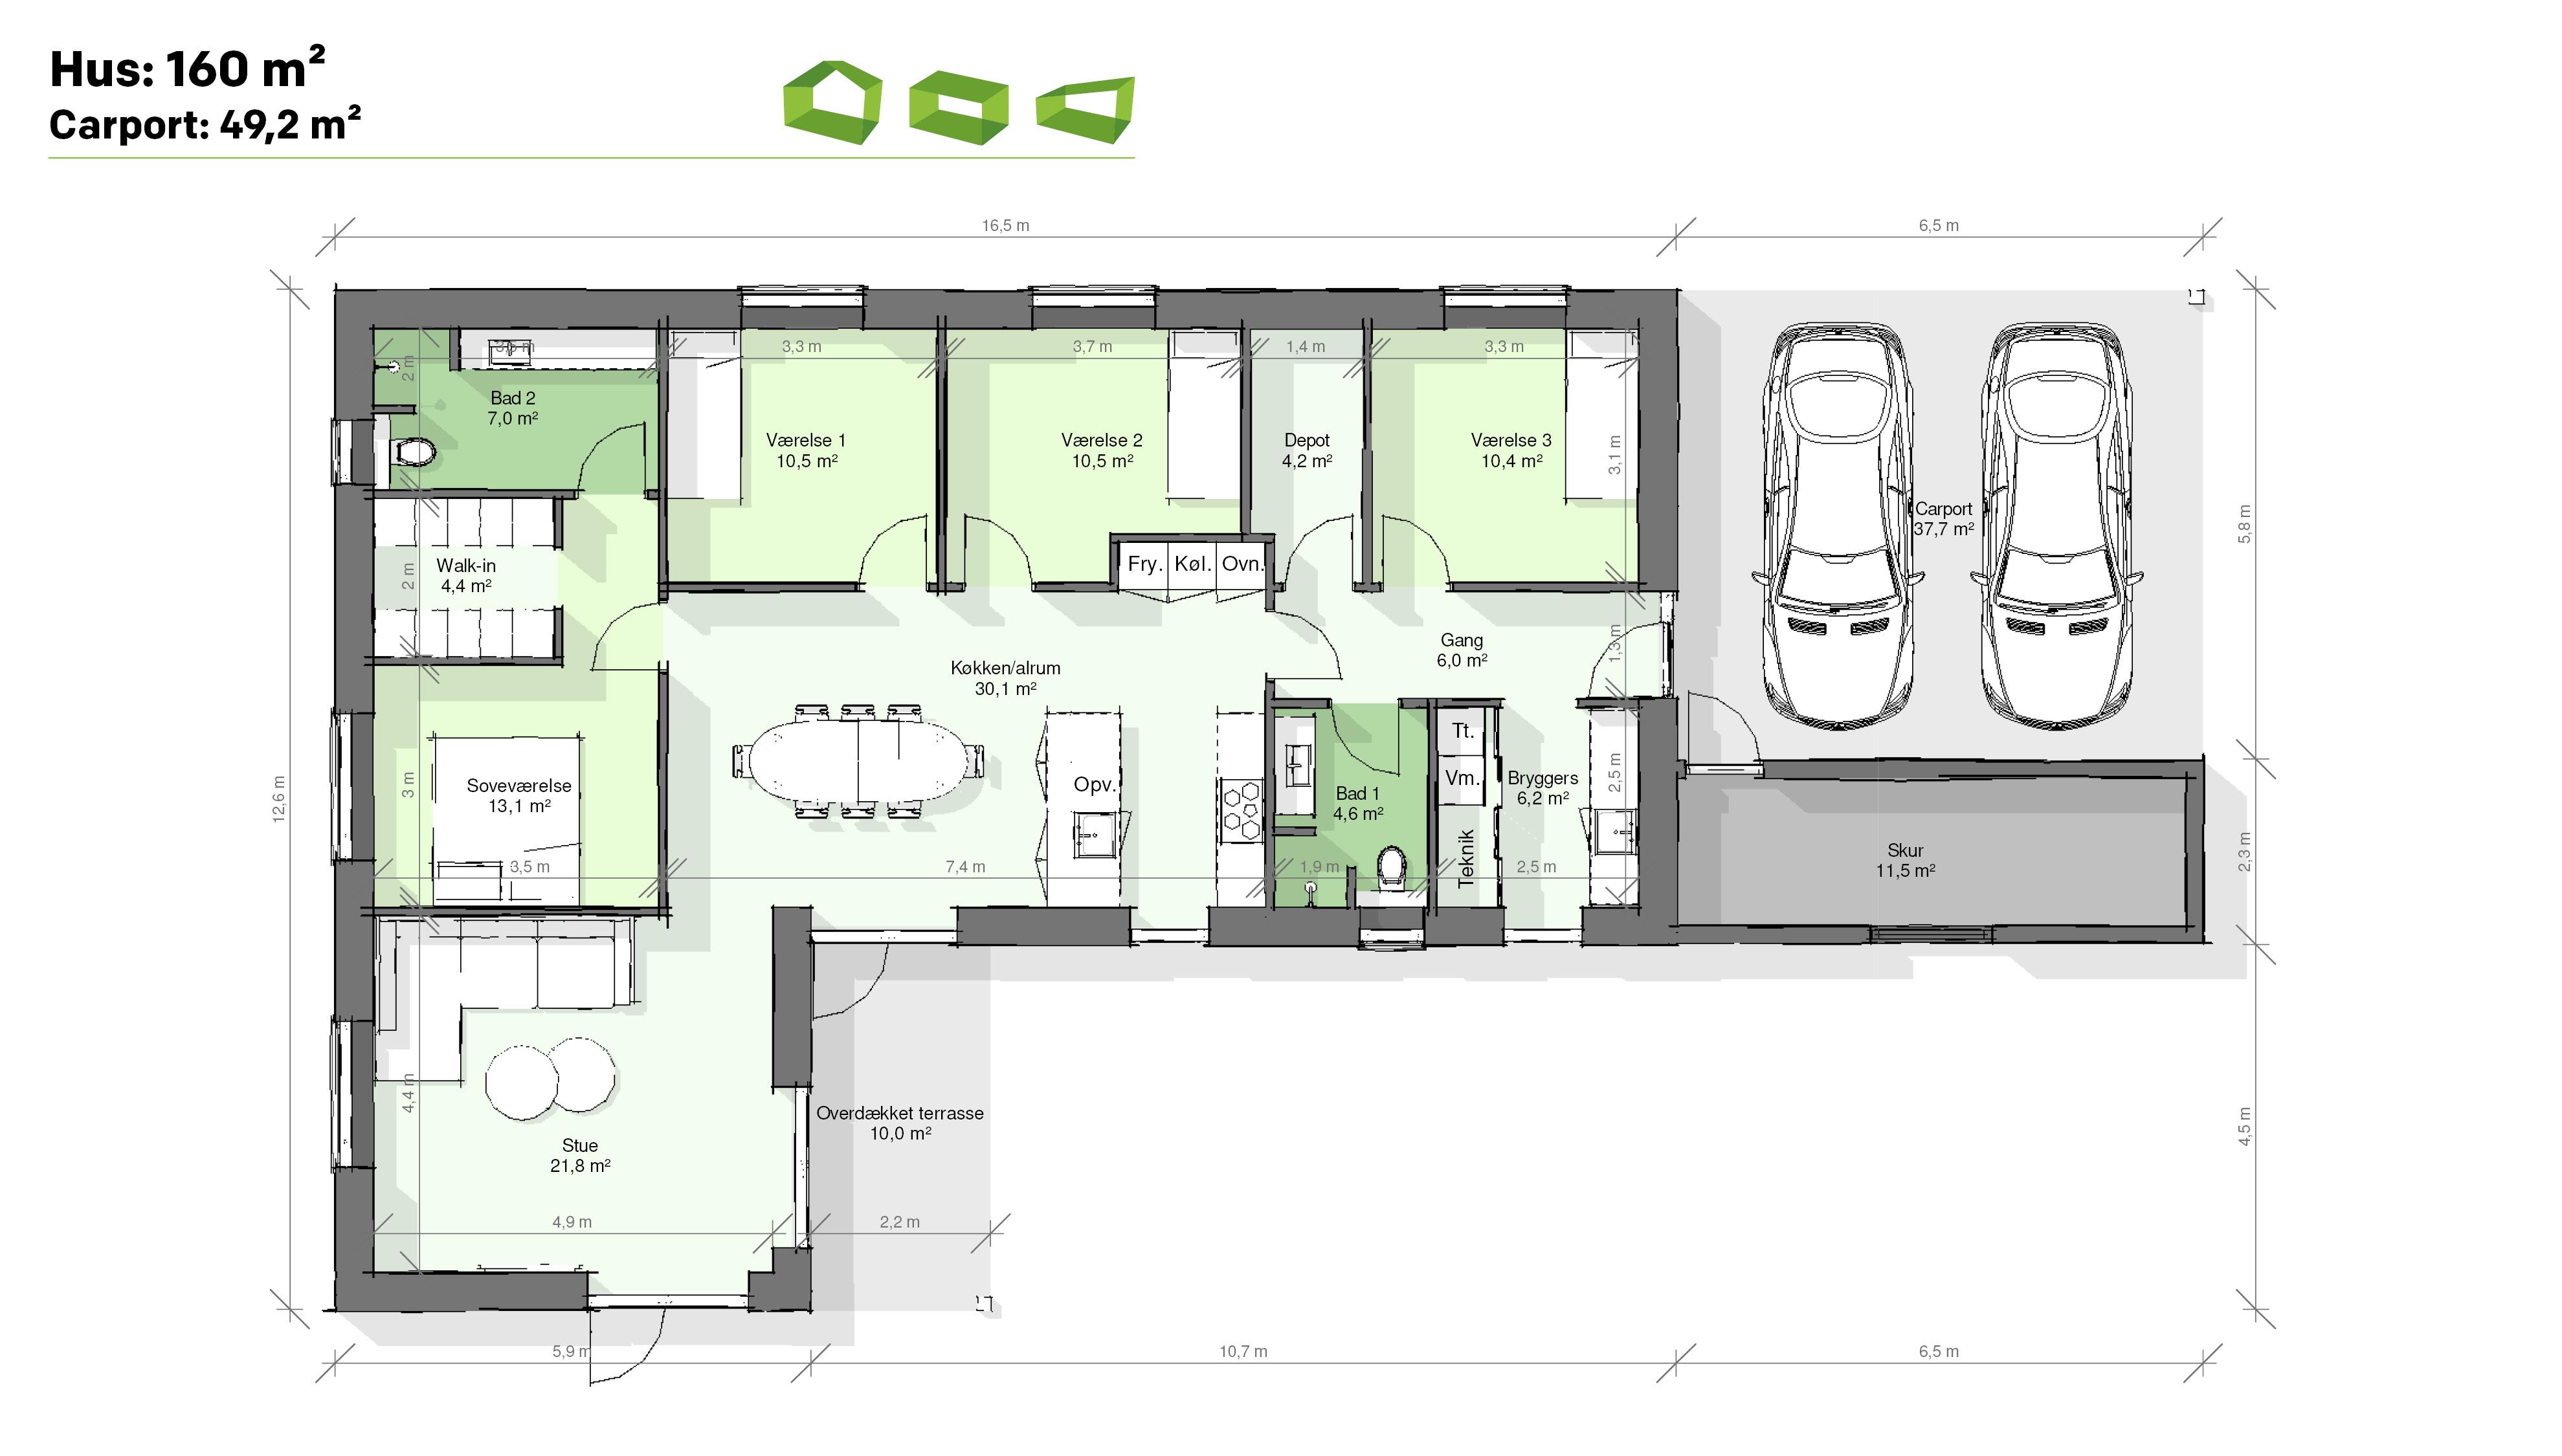 plantegning vinkelhus 160 m2